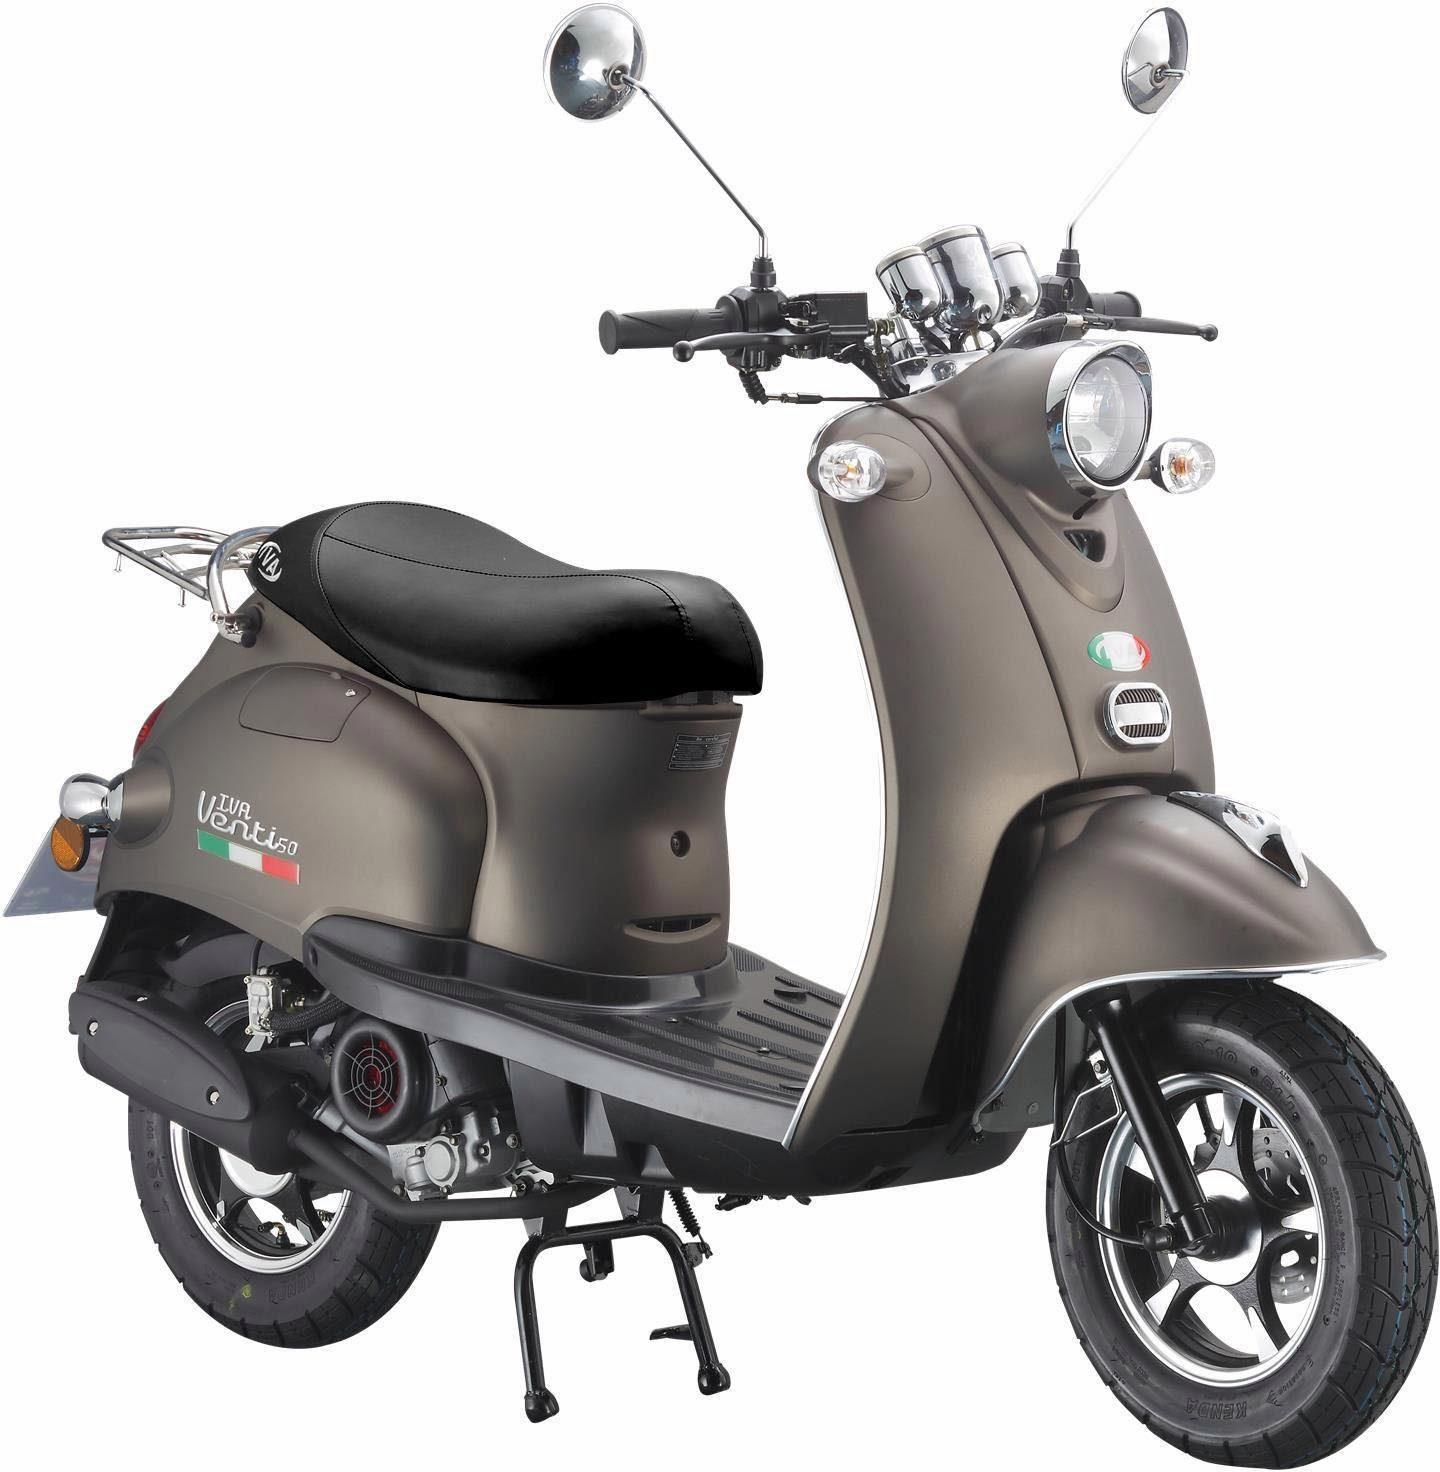 IVA Motorroller 49 ccm, 3 PS, 45 km/h, für 2 Personen, »VENTI«